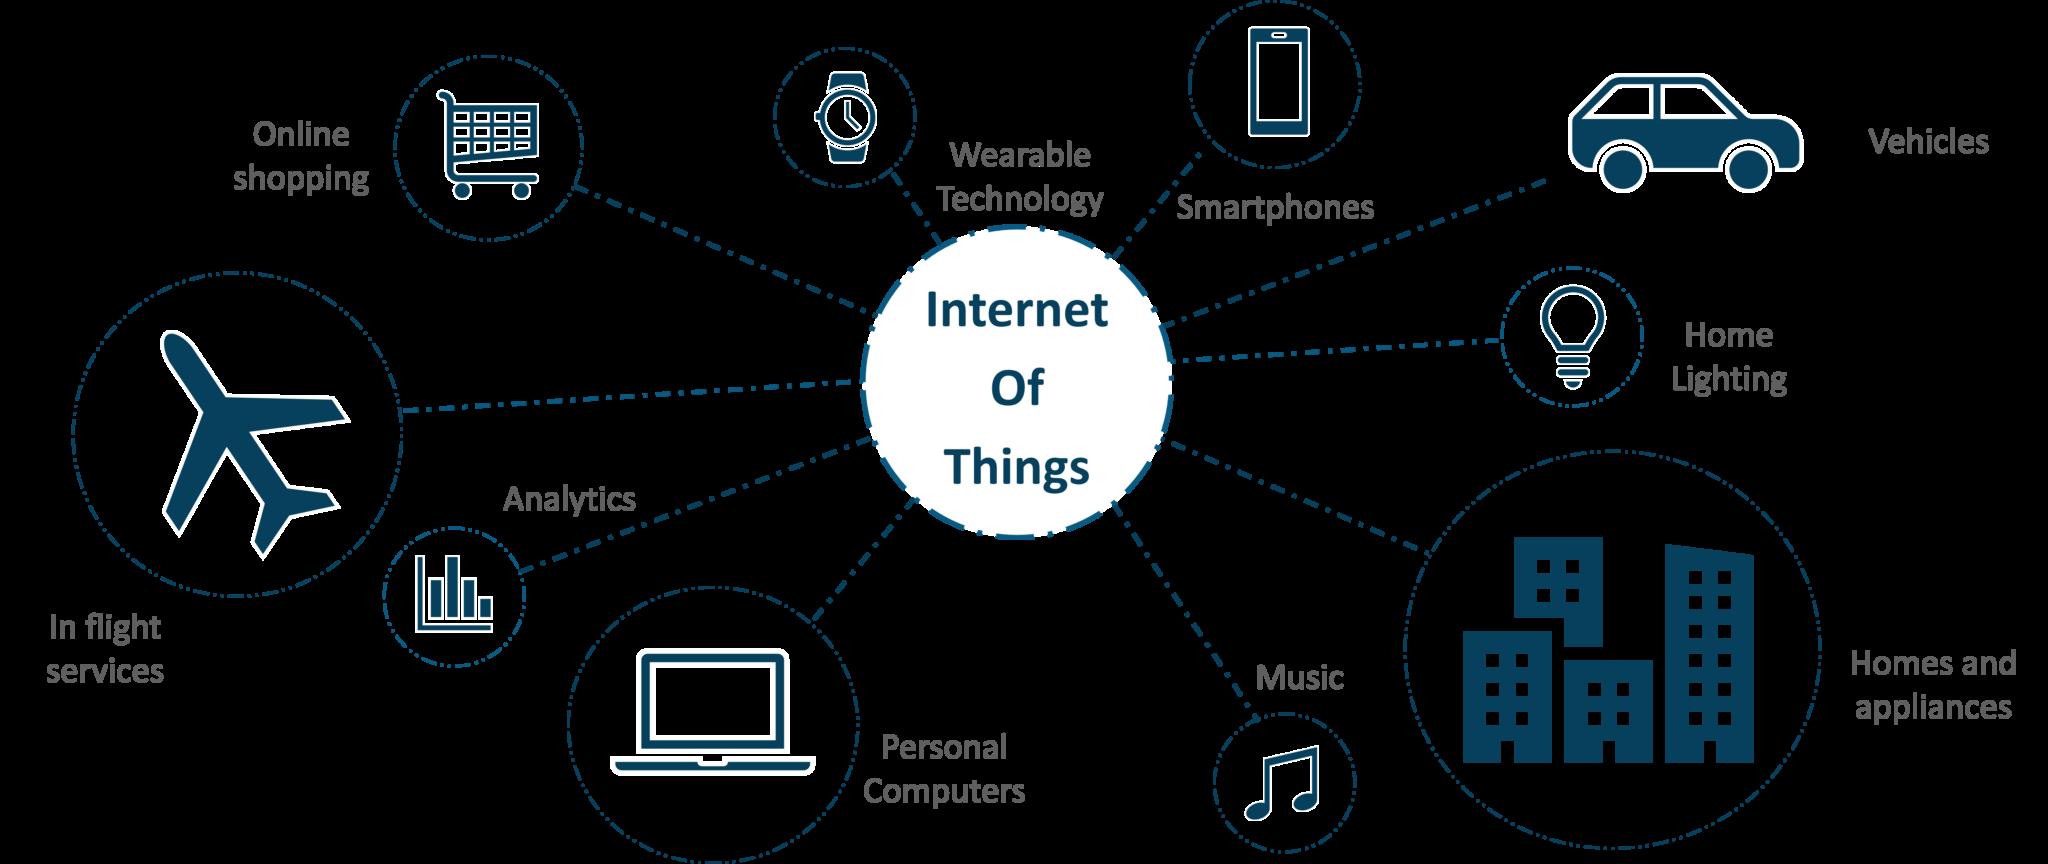 IoT in Everyday life - IoT Applications - Edureka